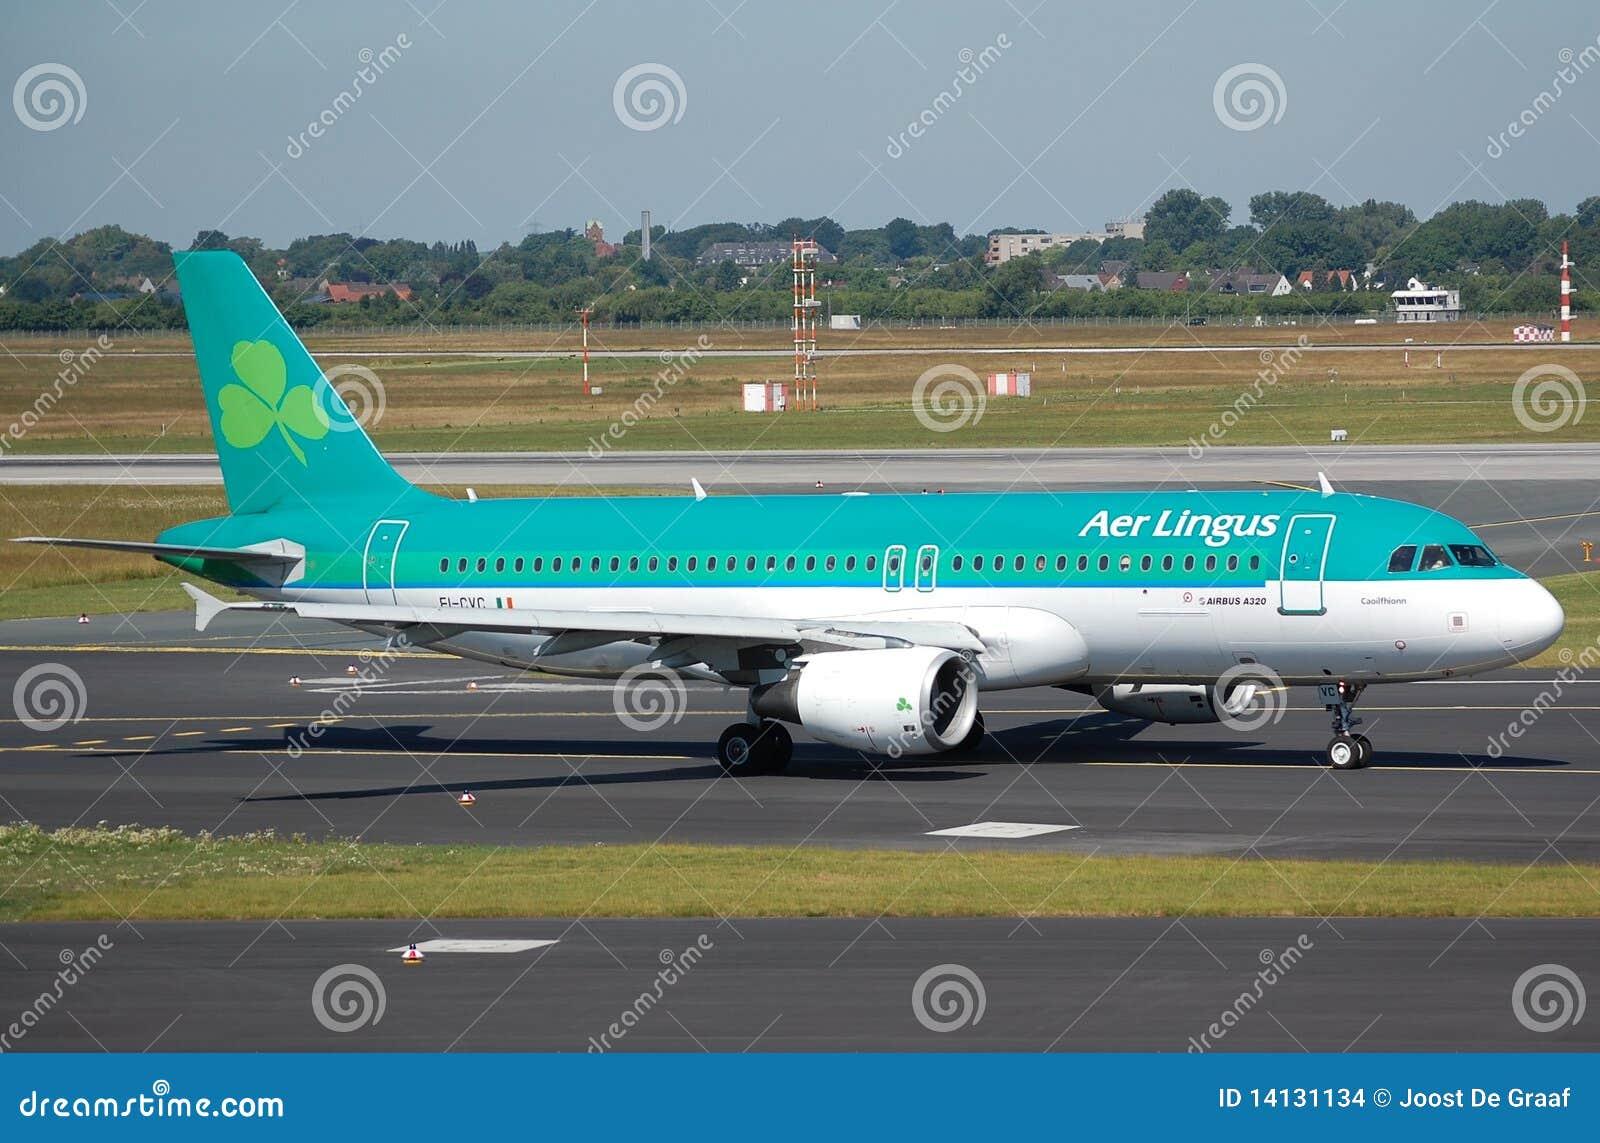 Air Lingus Airbus 320